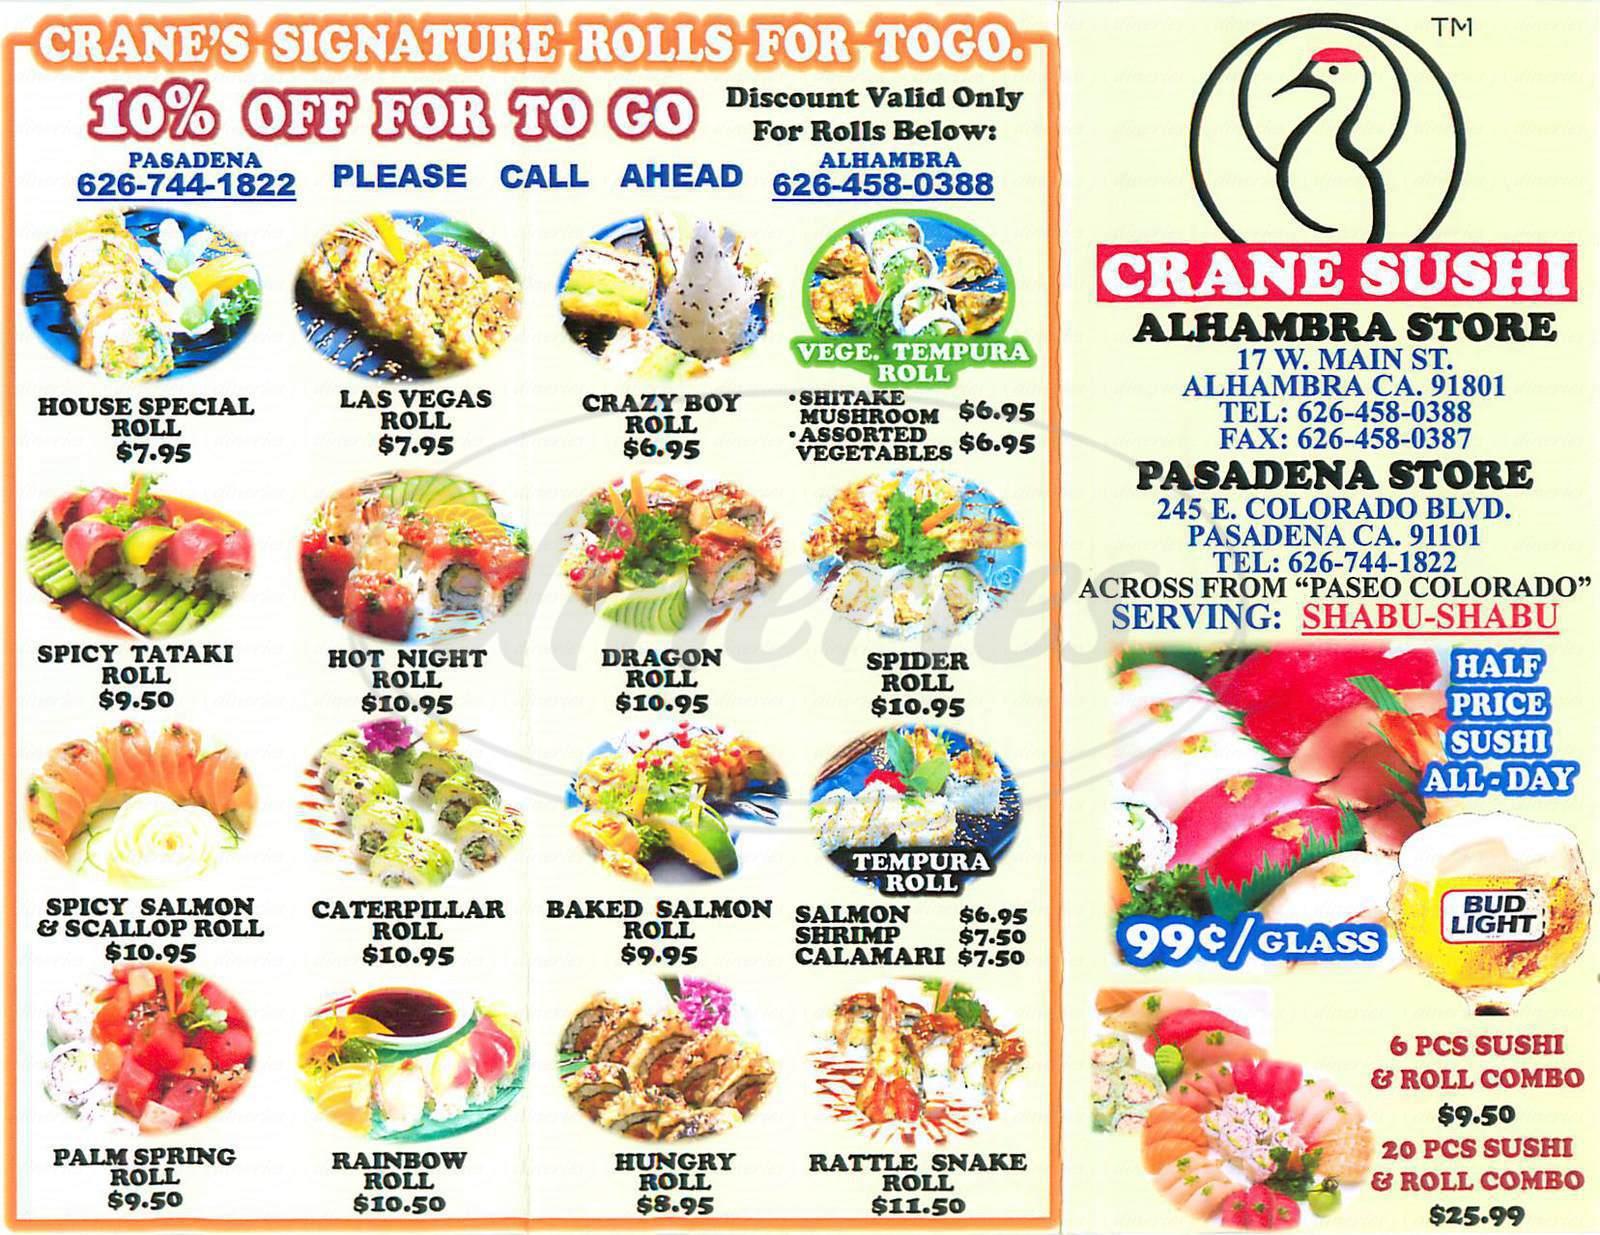 menu for Crane Sushi